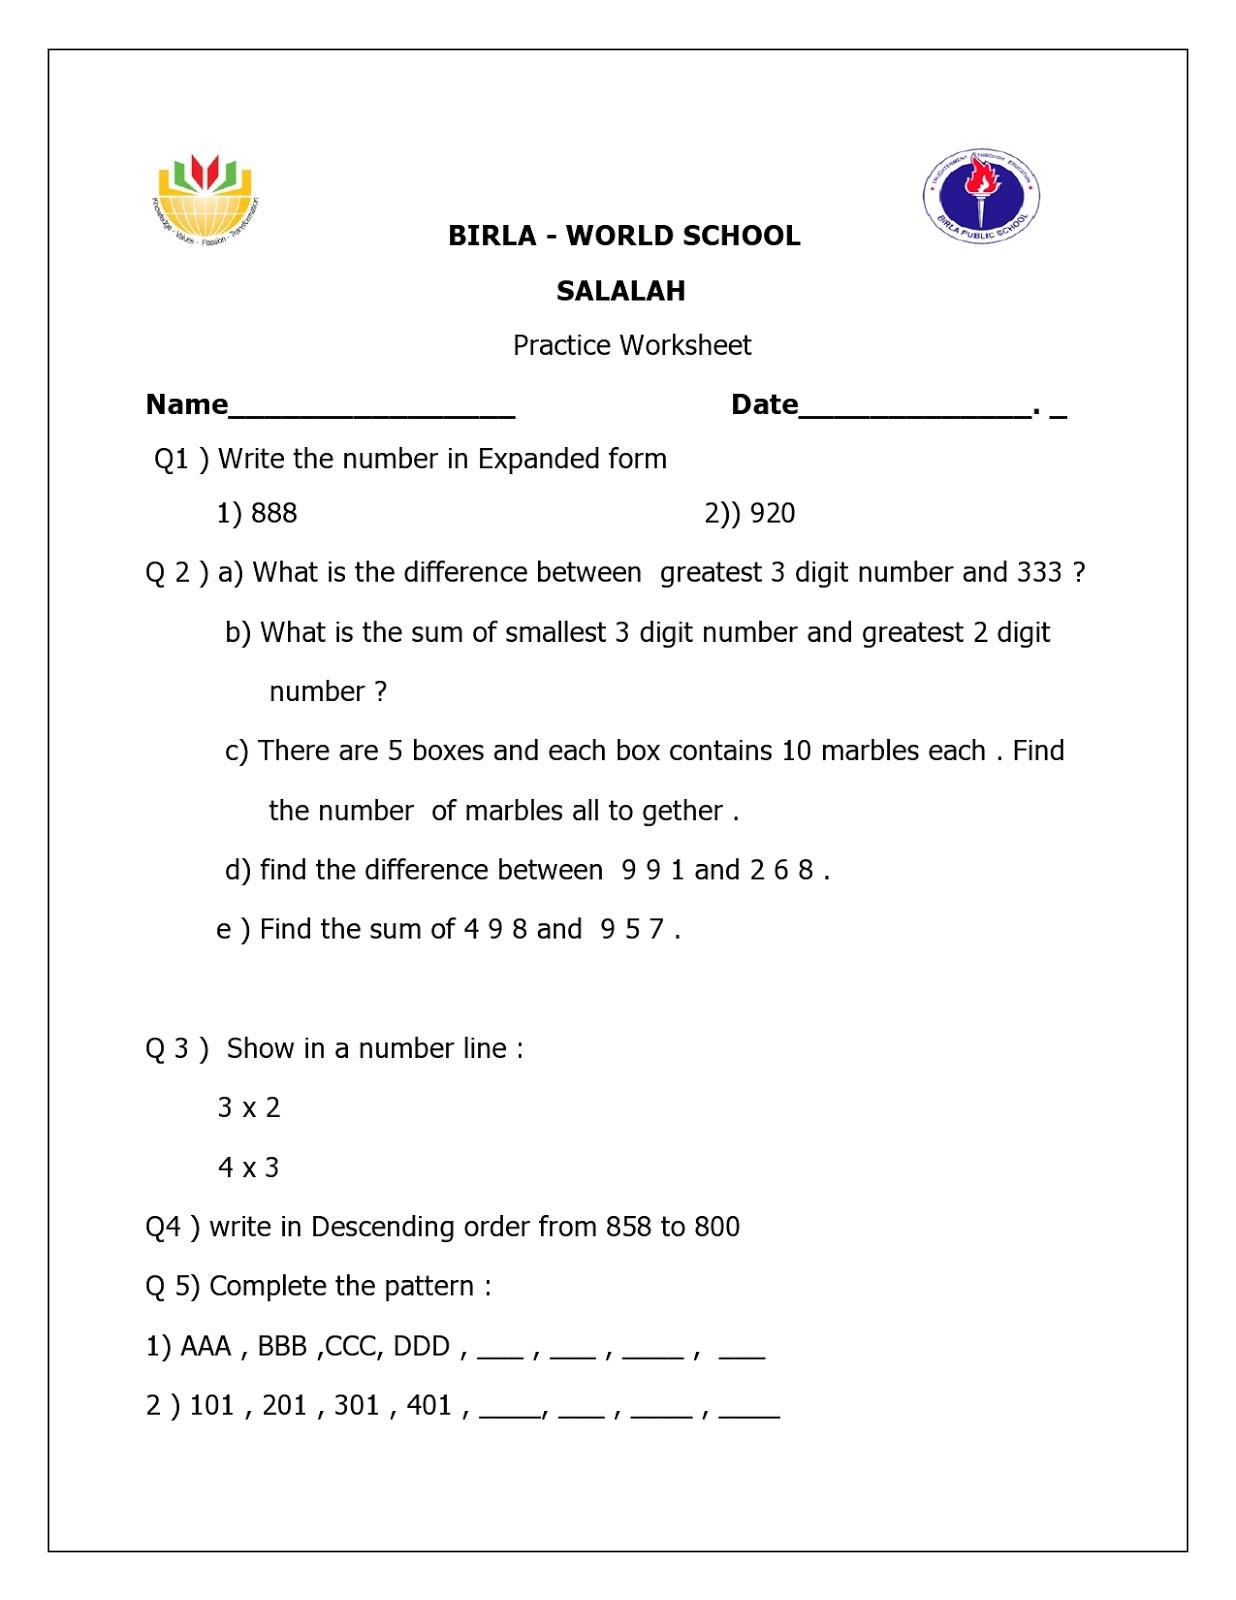 Birla World School Oman Homework For Grade 2b On 29 10 15